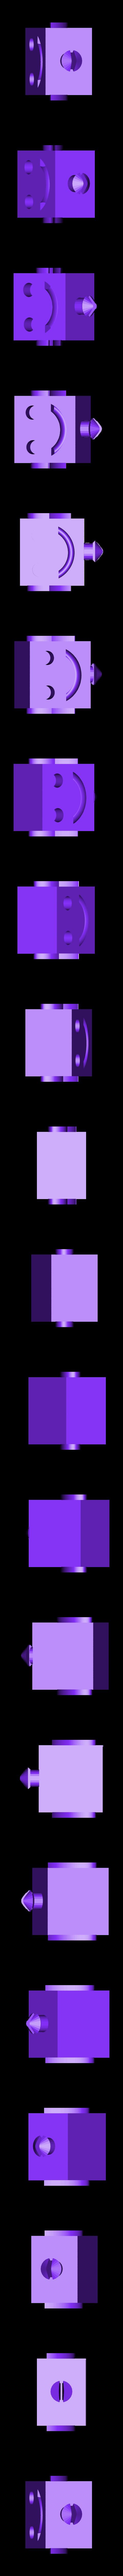 Tete .stl Download free STL file Robotic mascot robot V2 • 3D printer template, EdeziV